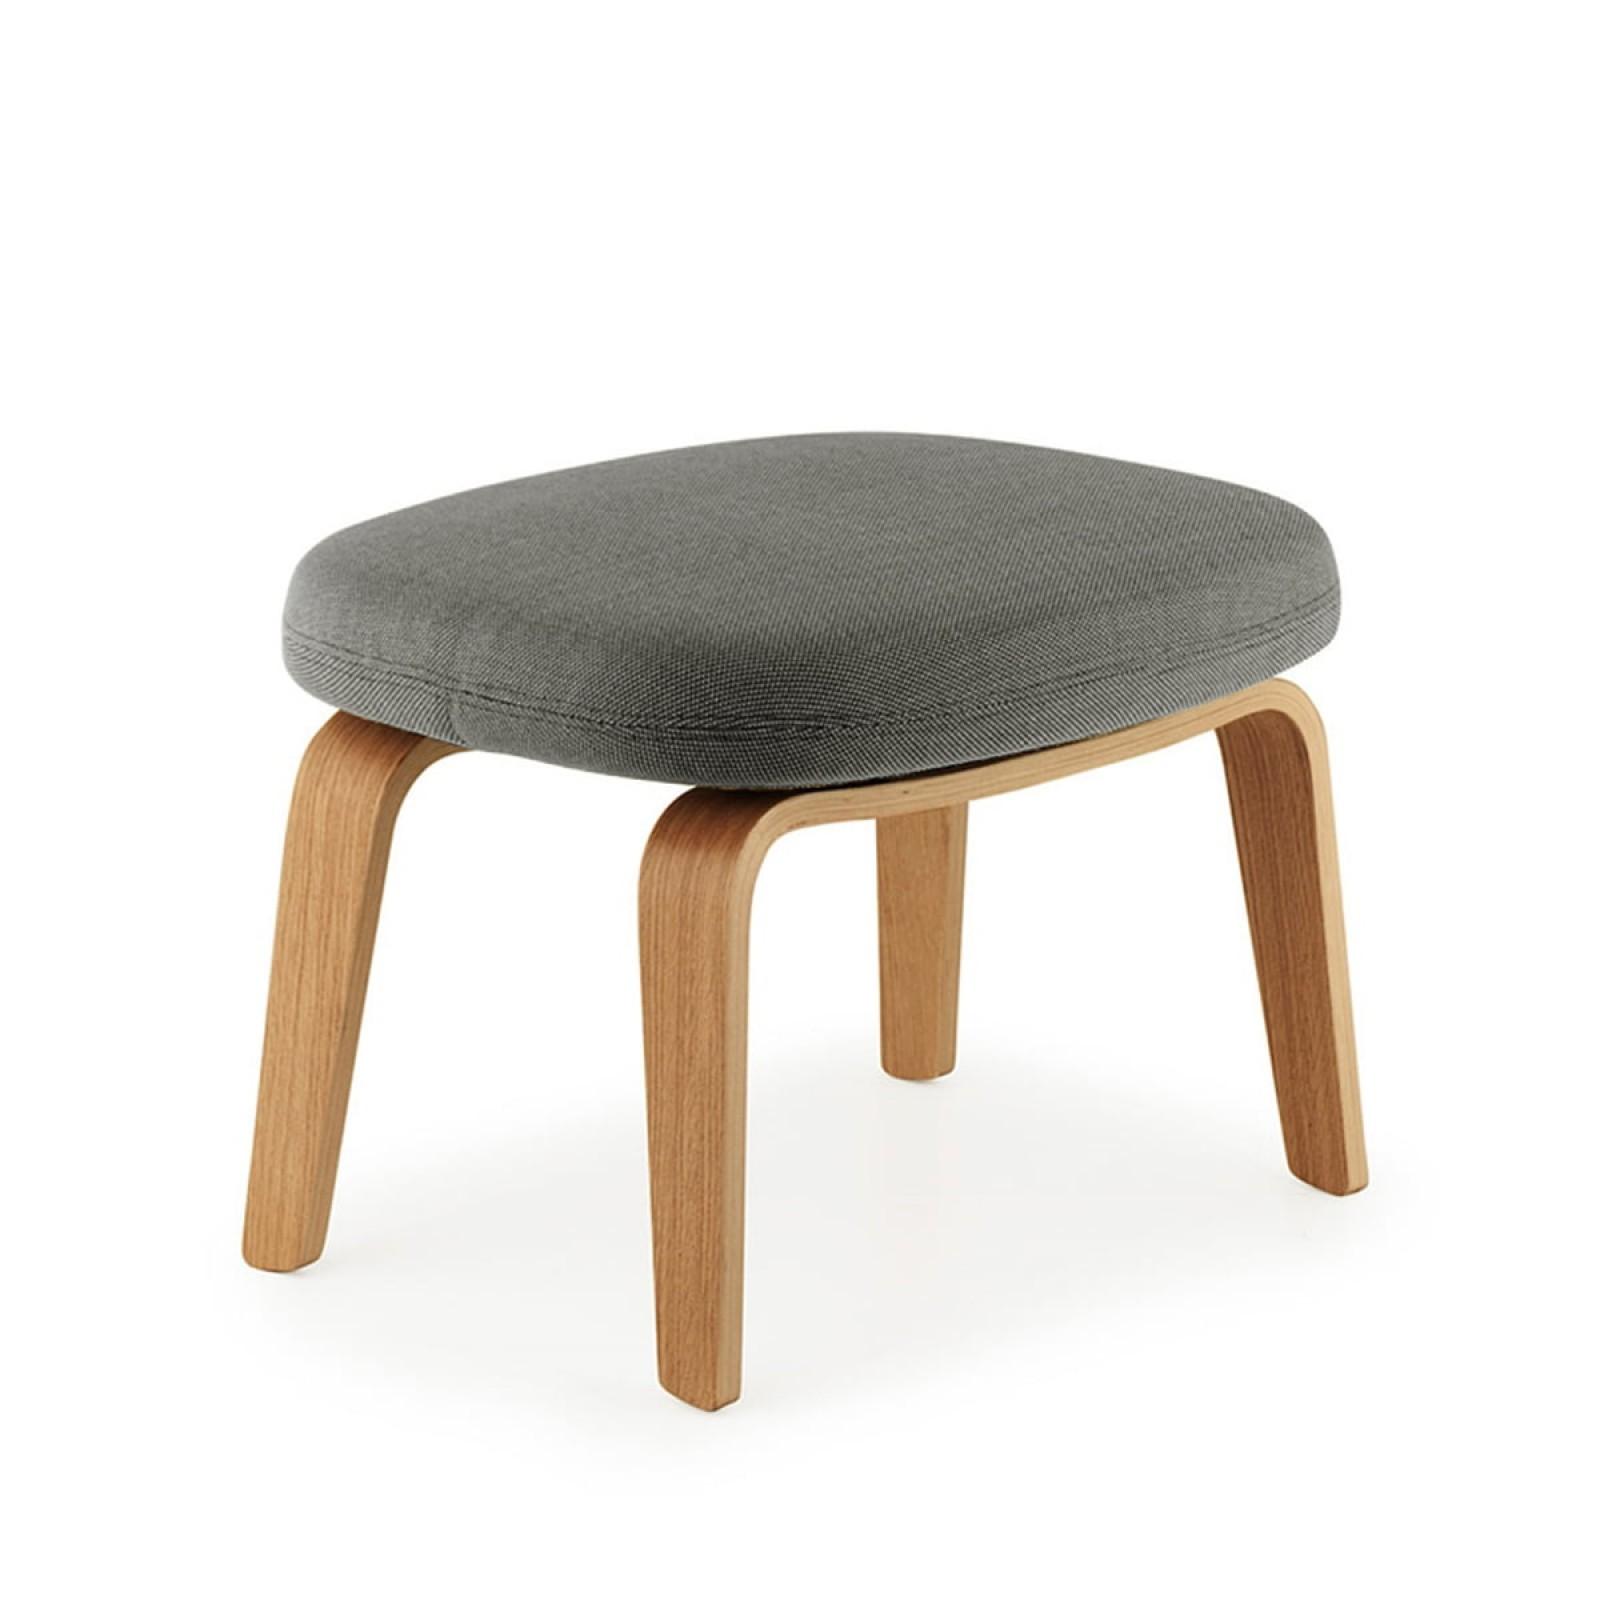 Era Footstool (Wood) - Normann Copenhagen